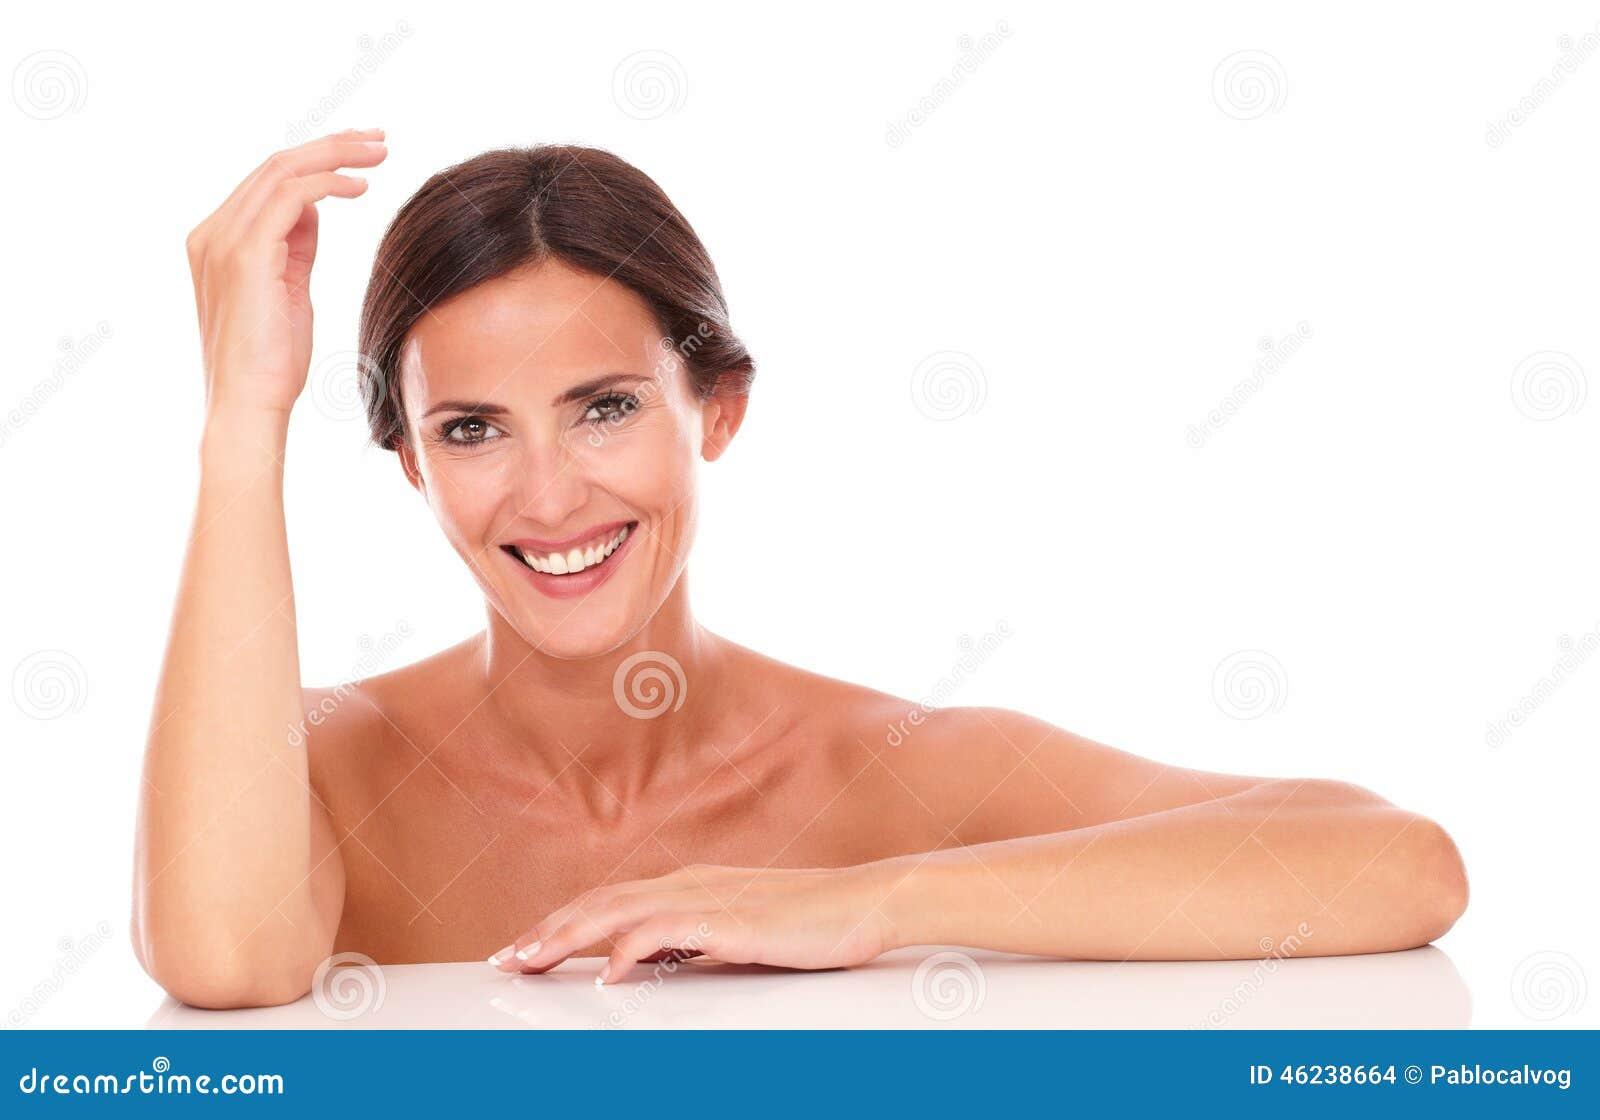 Free mature nude thumbs